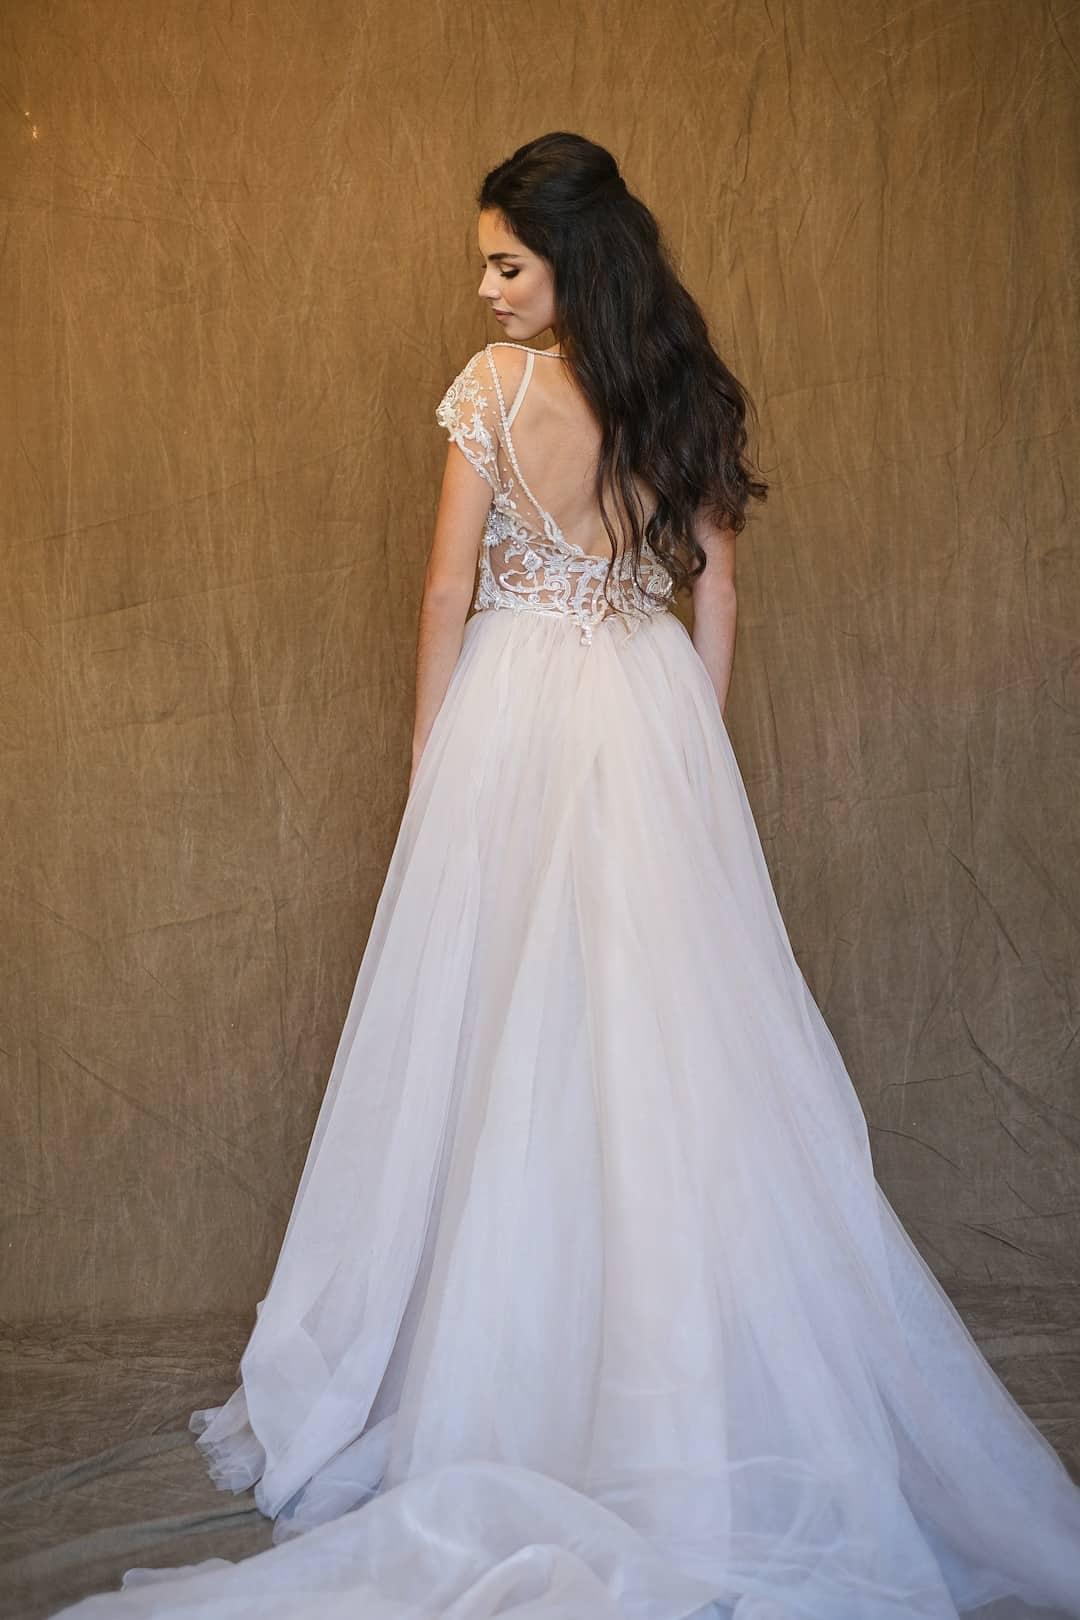 Haute Couture Brautkleider - Galia Lahav - Gala 607 - back